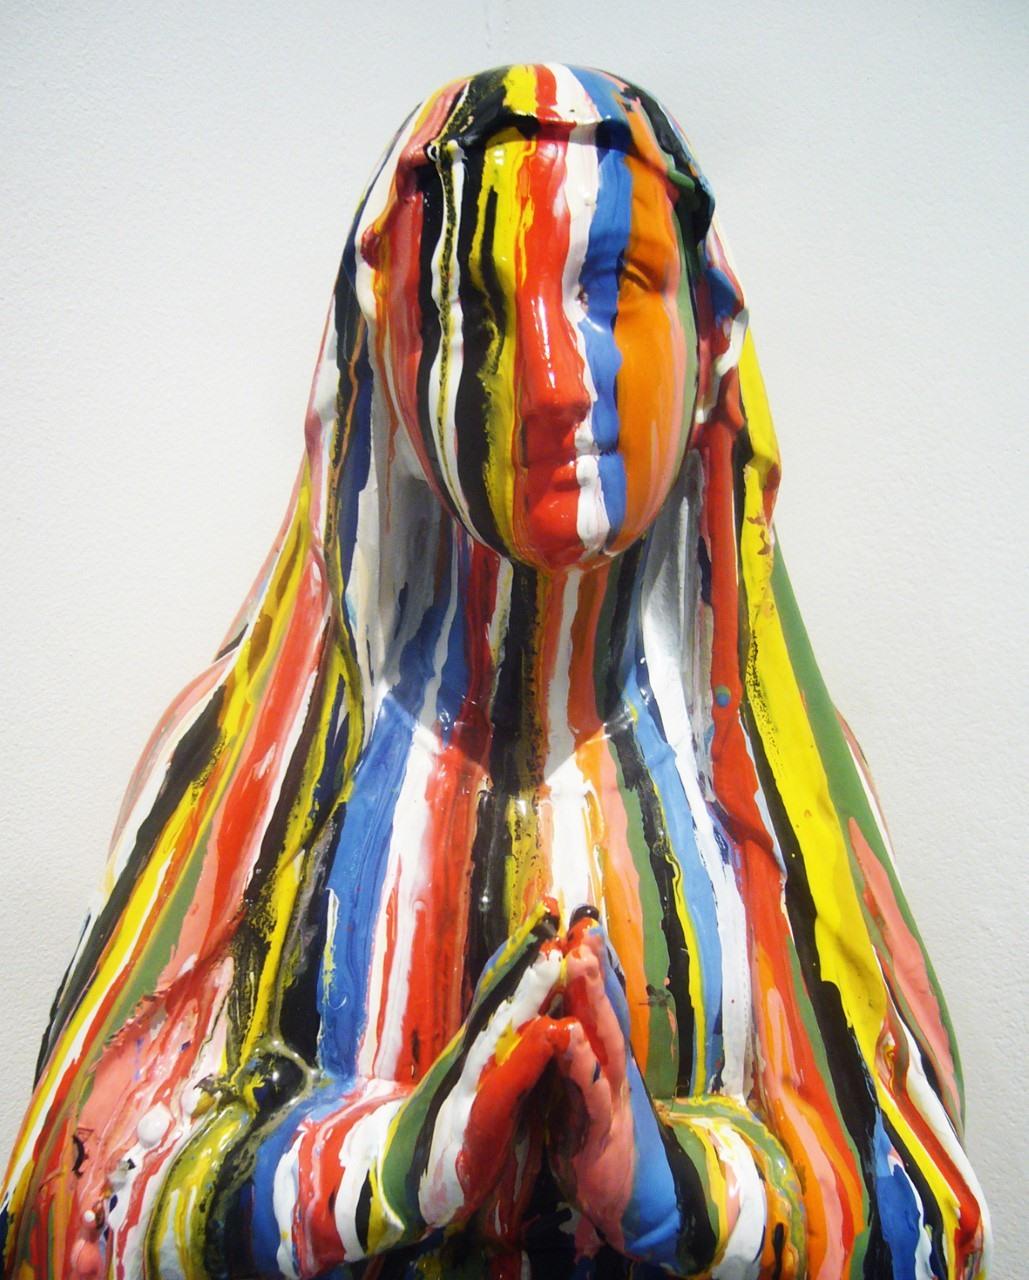 sculpture peinture vierge pisseuse